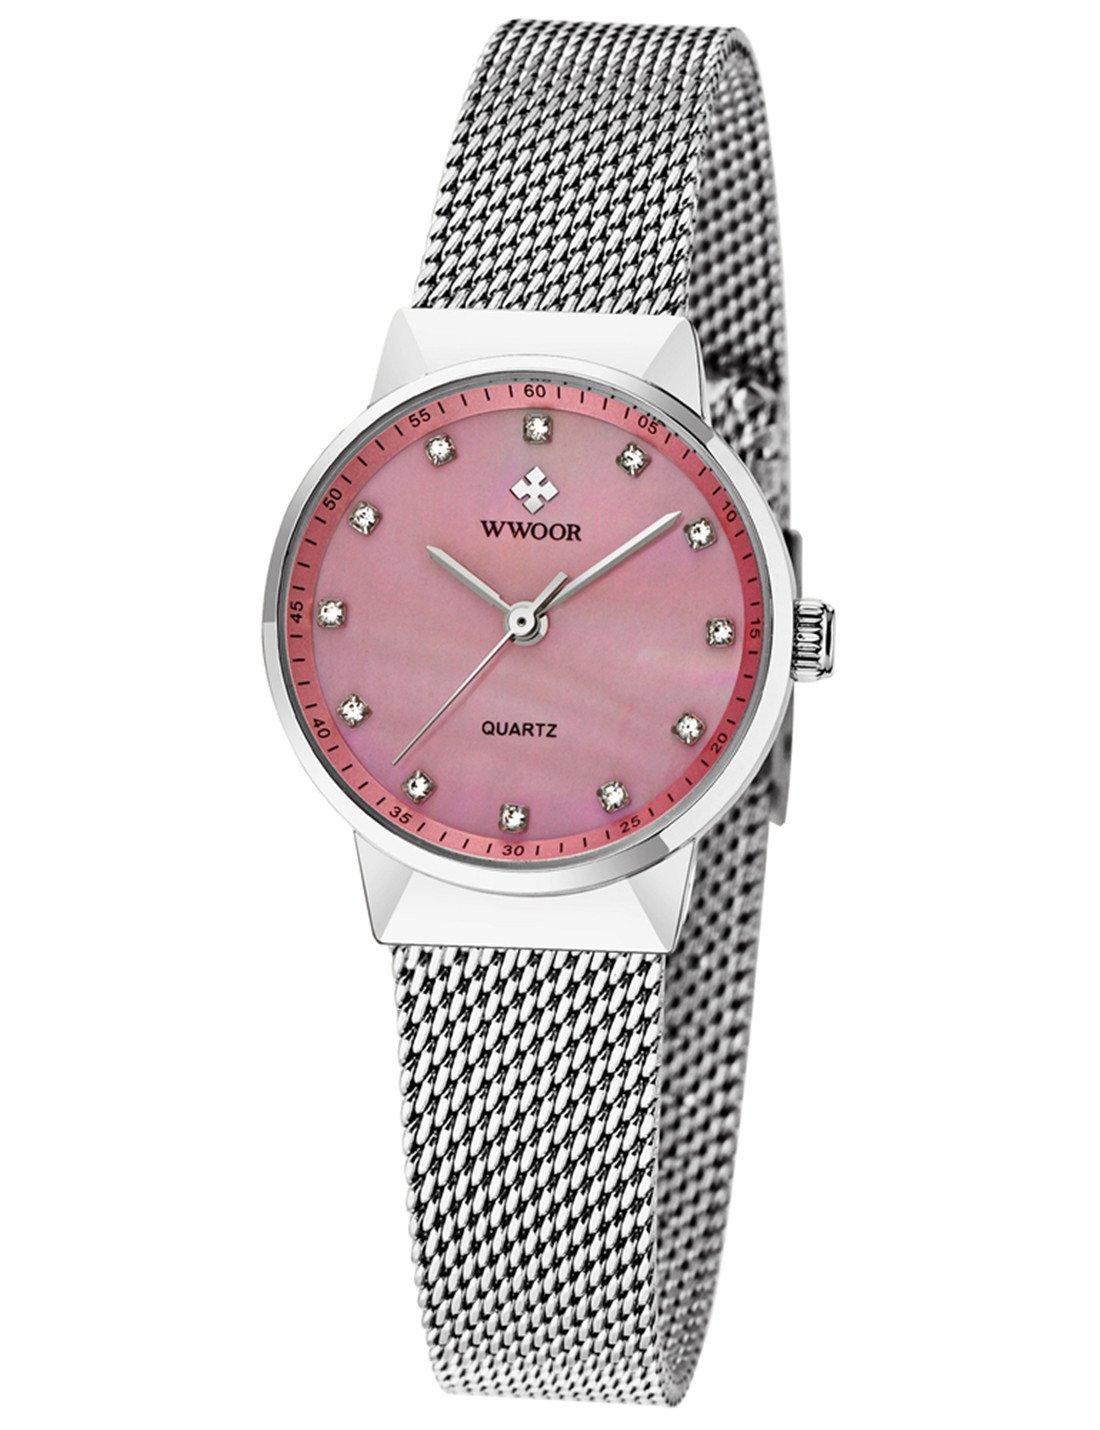 WWOOR Women's Rhinestone Stainless Steel Mesh Band Quartz Watch Casual Business Wristwatch Pink